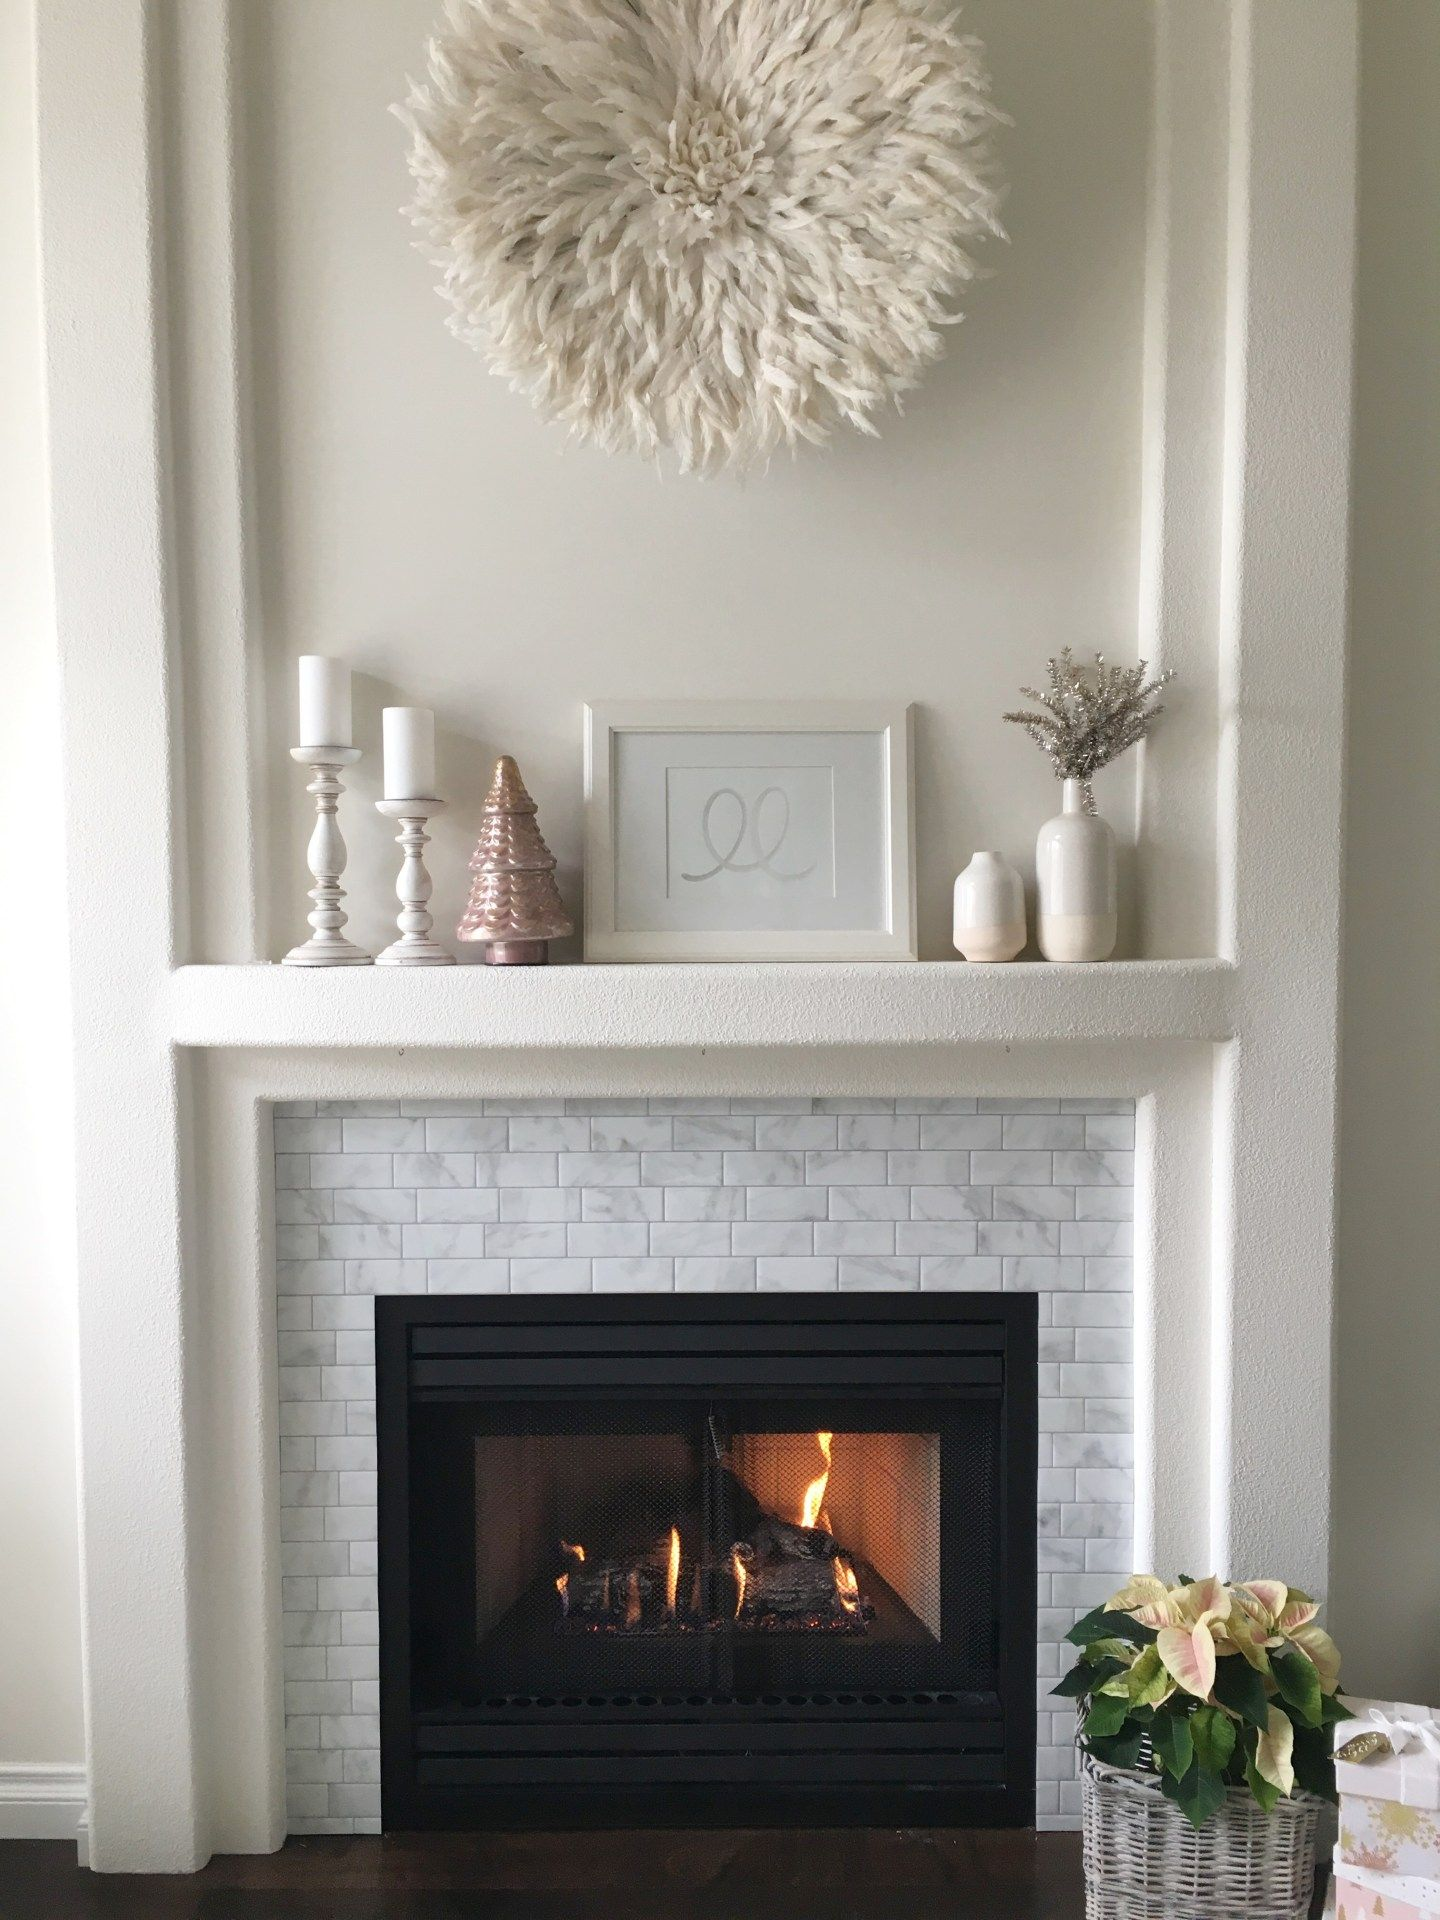 Smart Tiles Diy Fireplace Makeover Judy Dill Fireplace Makeover Home Fireplace Smart Tiles